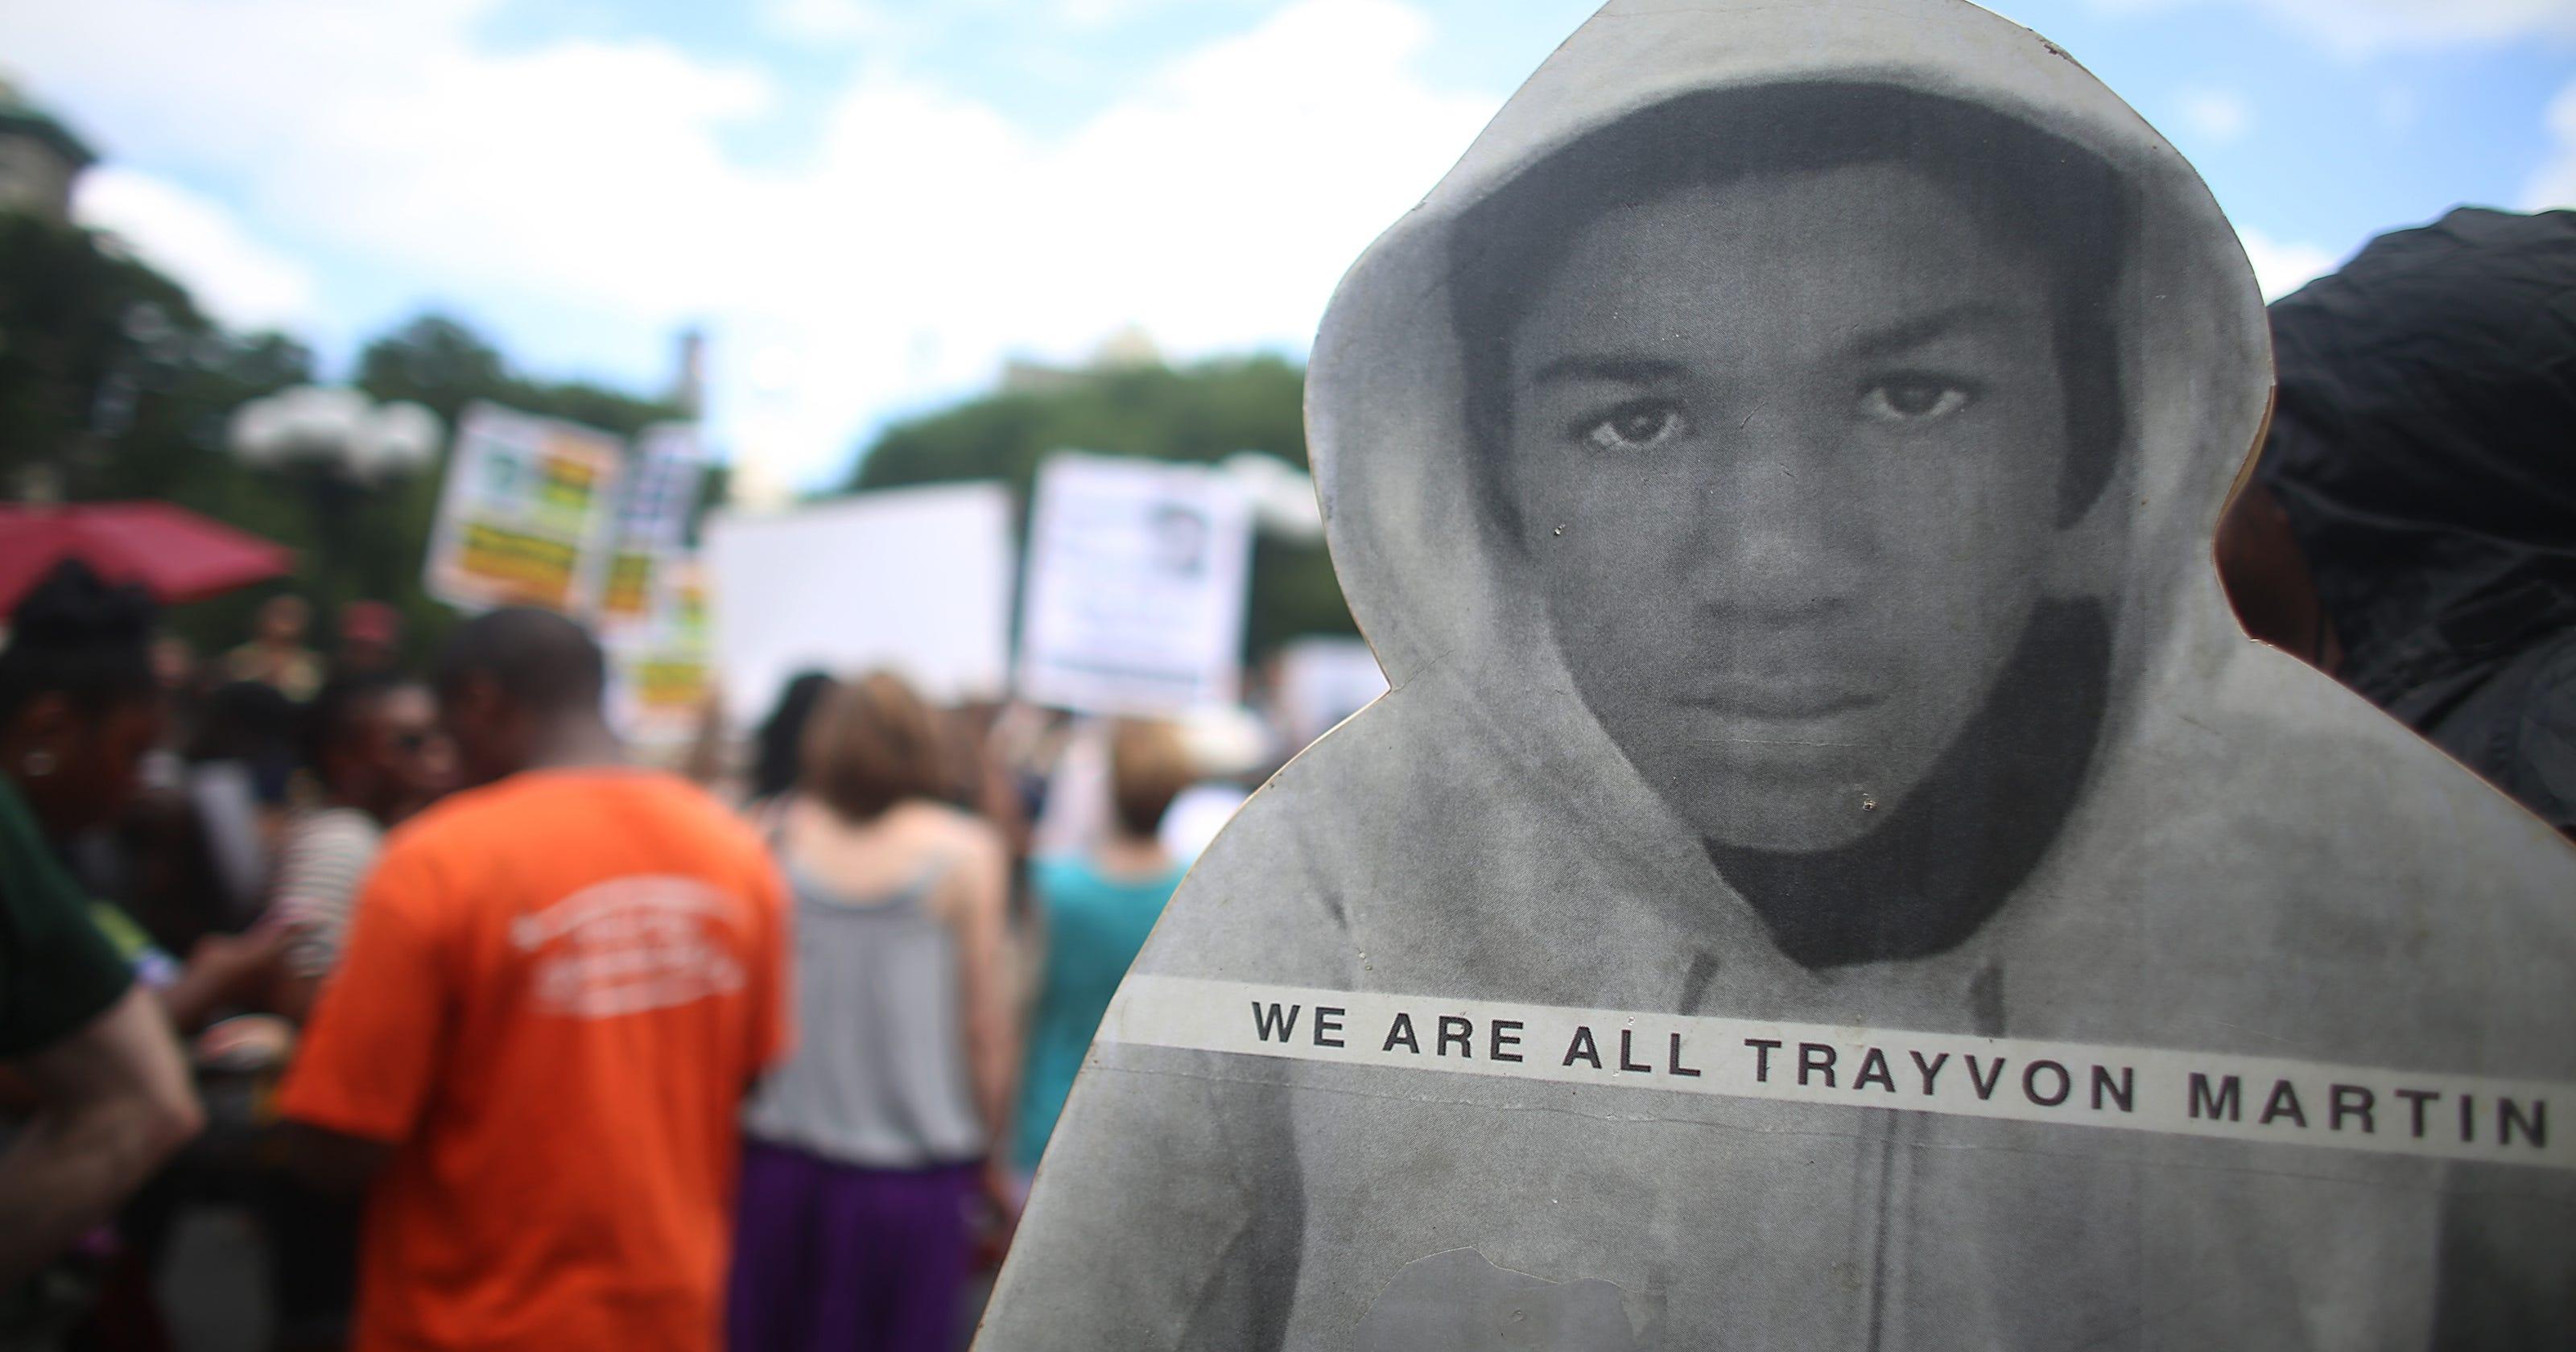 night trayvon martin died - HD1600×800